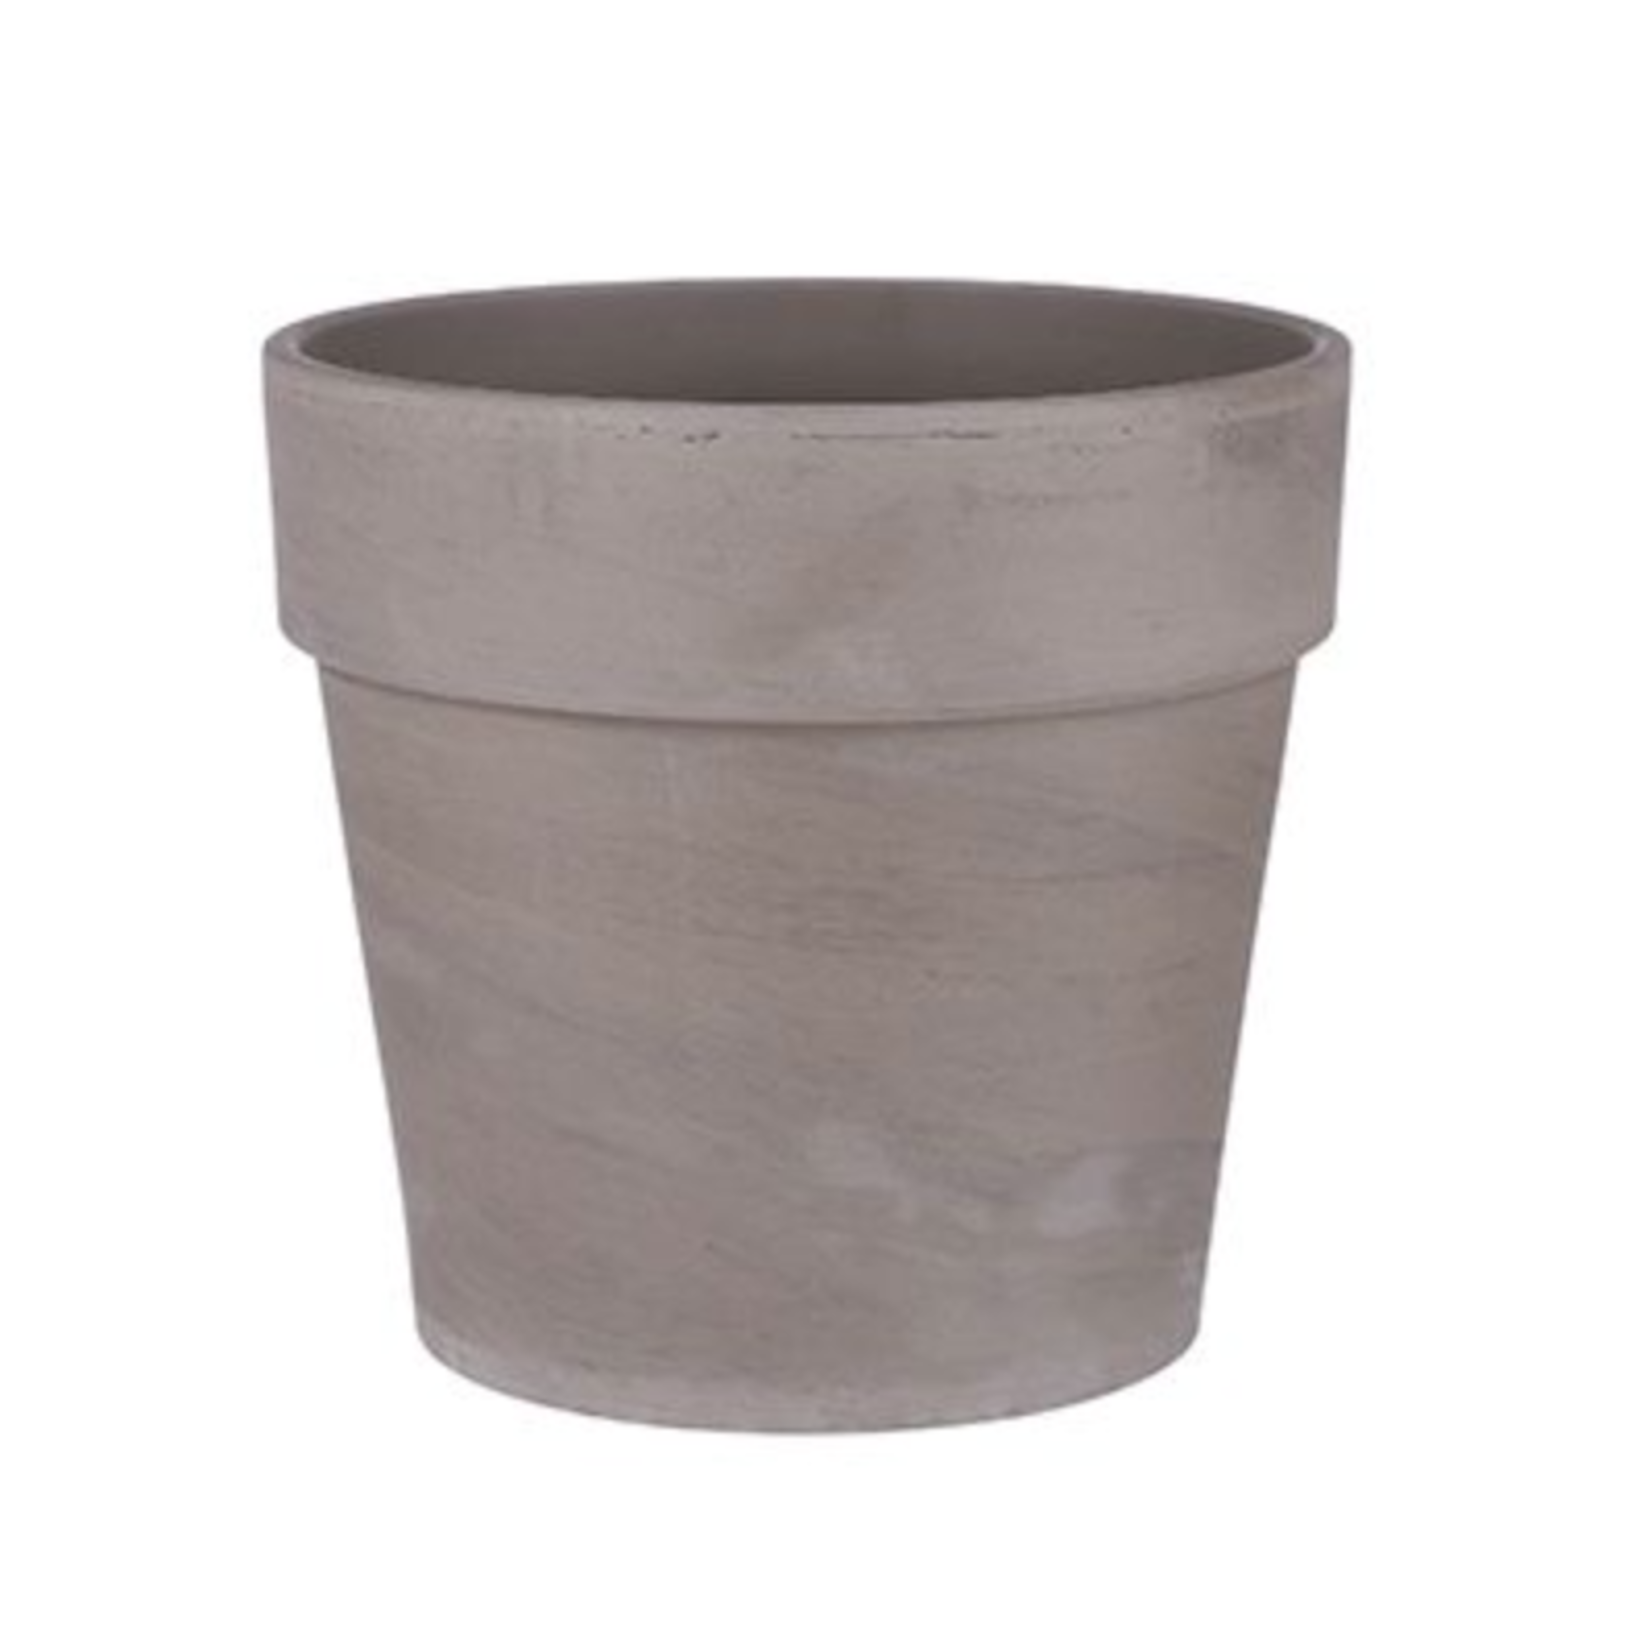 Edelman Carina grijs ∅ 31